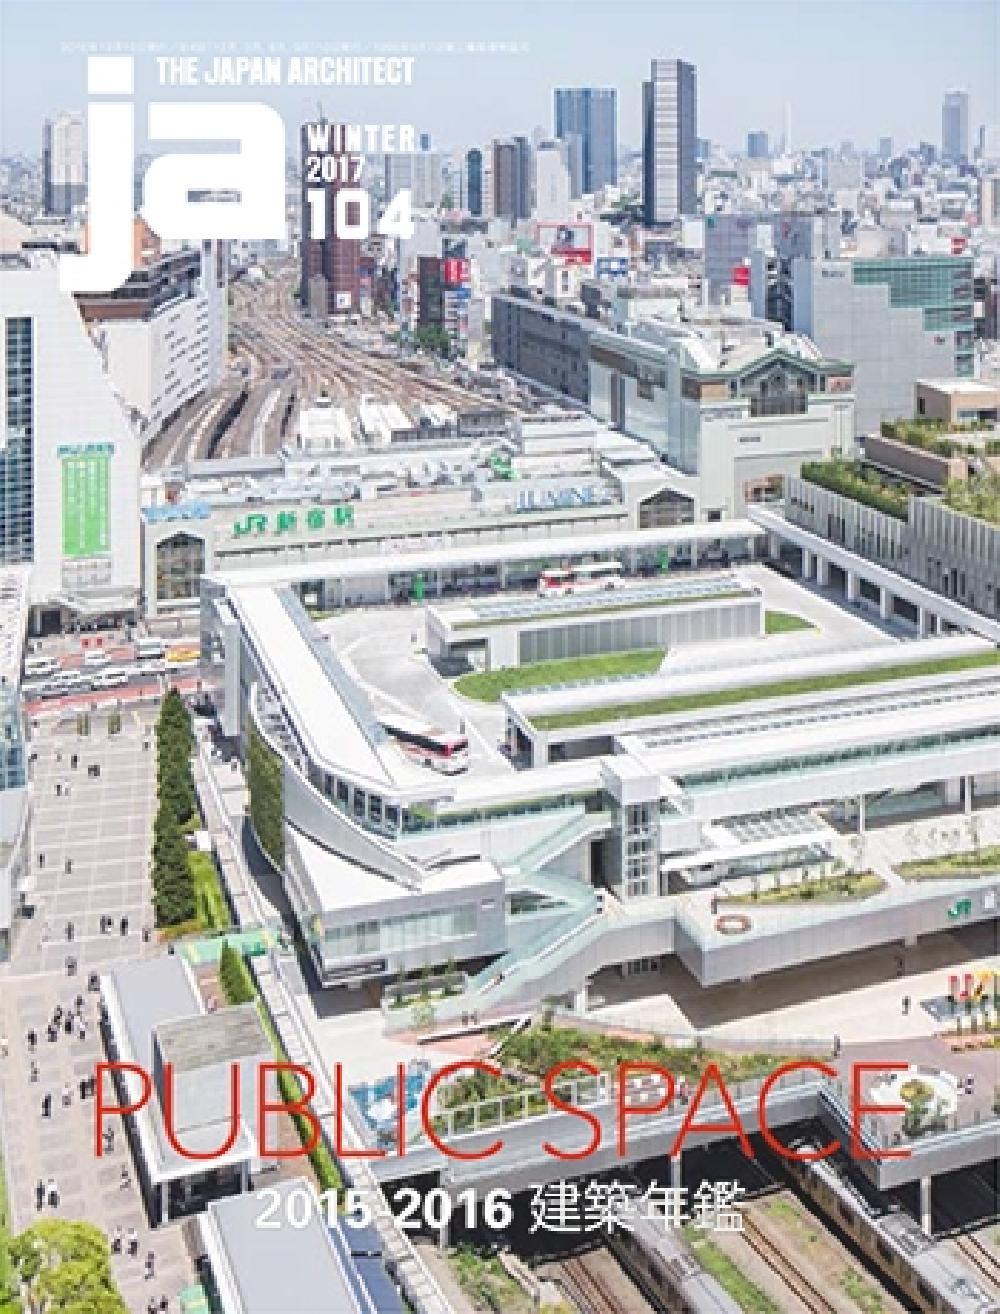 JA 104 Public Space 2015-2016